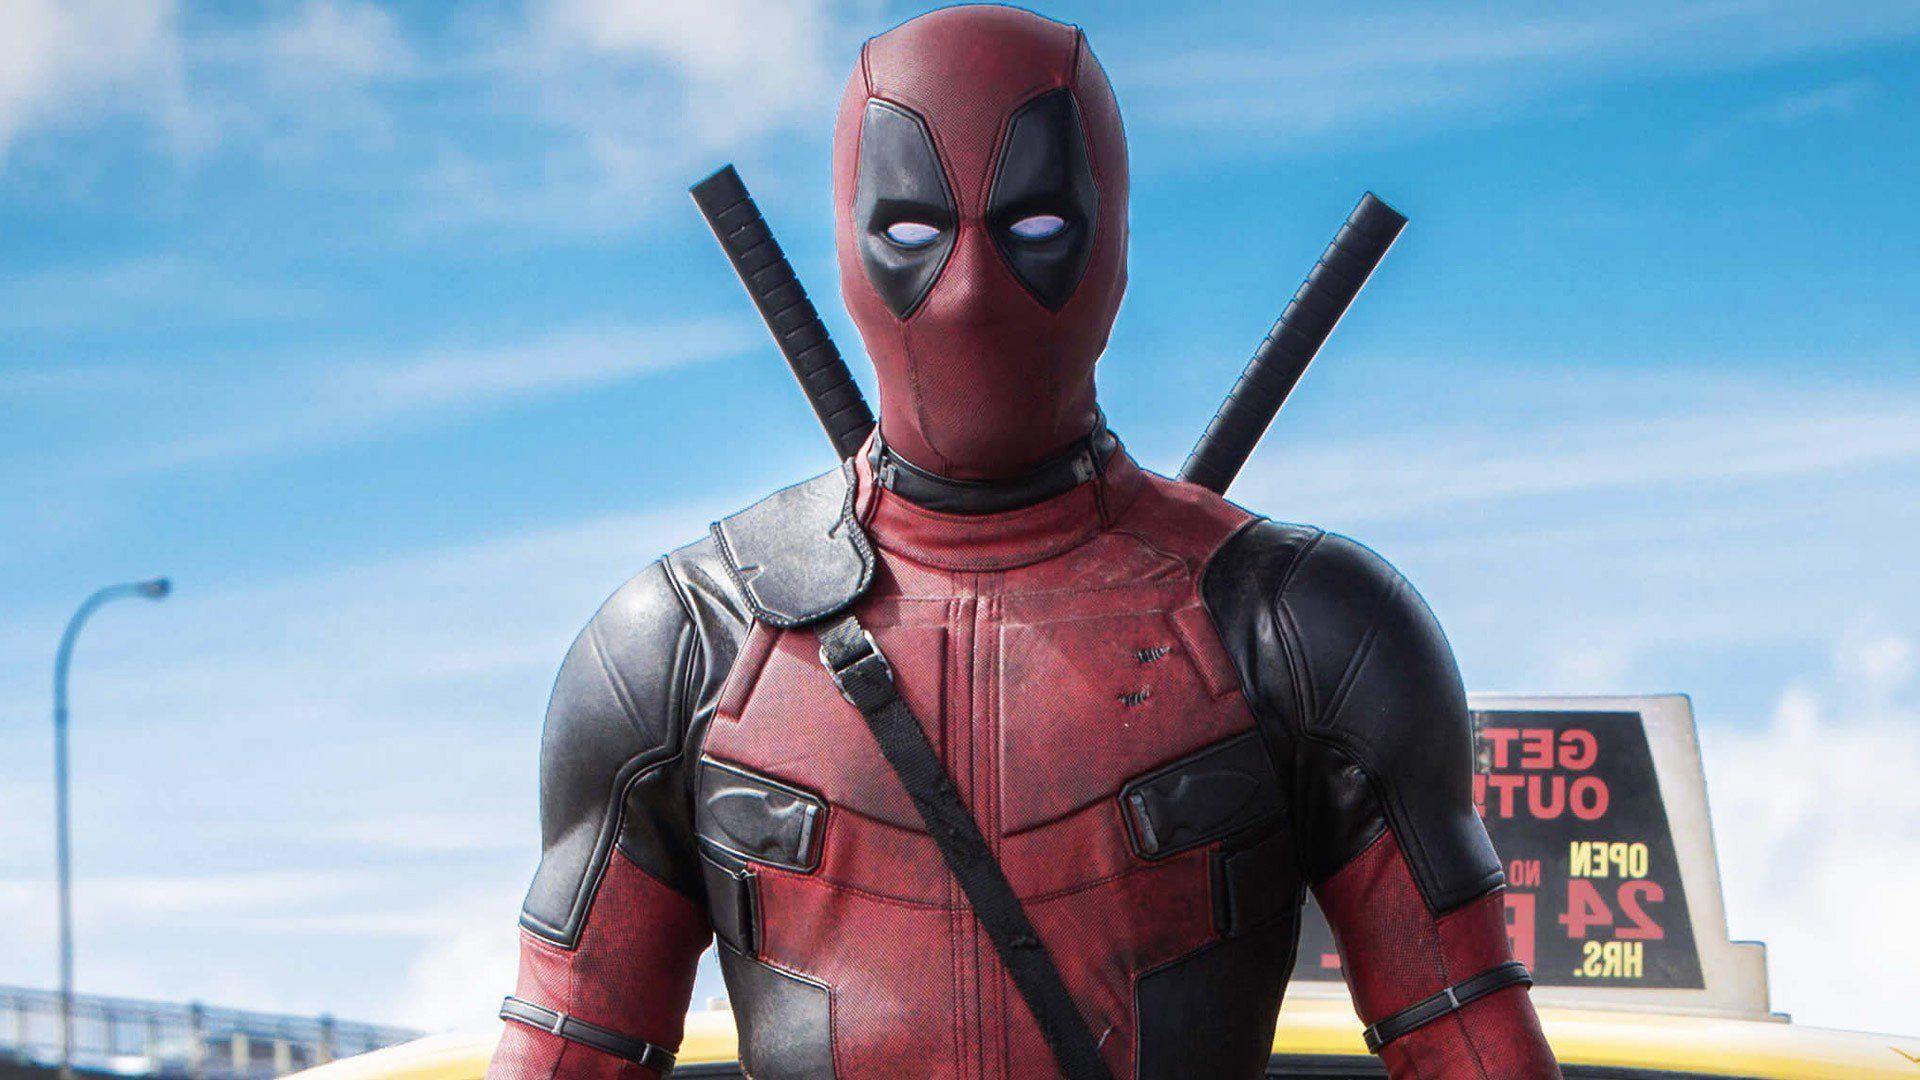 Deadpool Movie 2016 Wallpapers - Top Free Deadpool Movie 2016 ...